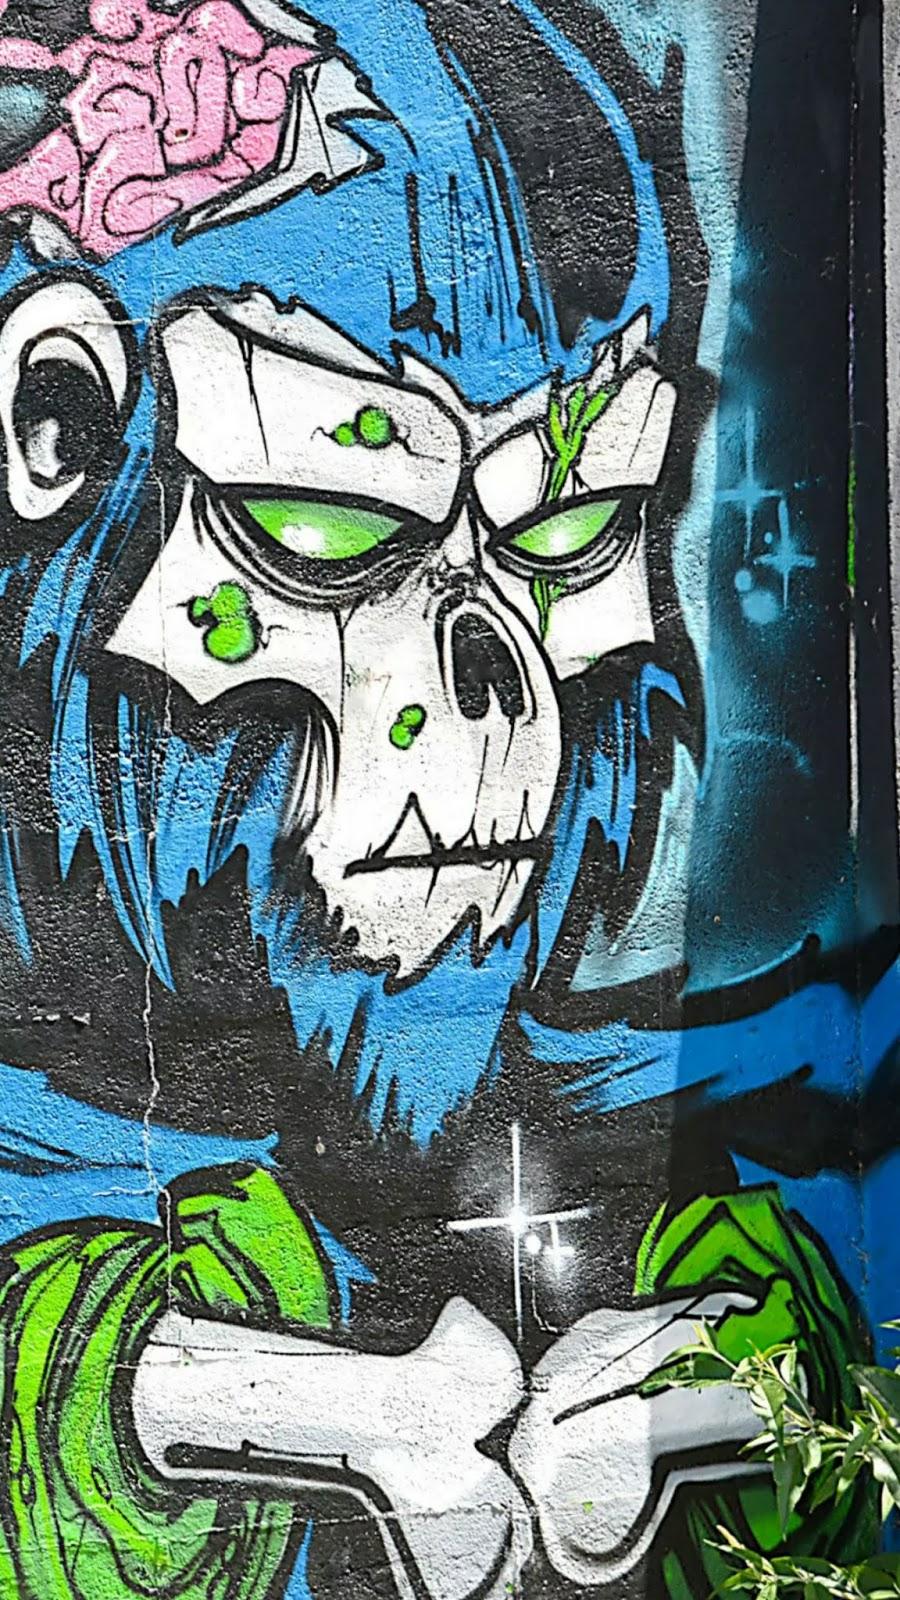 Wallpaper Graffiti Keren Untuk Hp Android - Street Art Monkey - HD Wallpaper